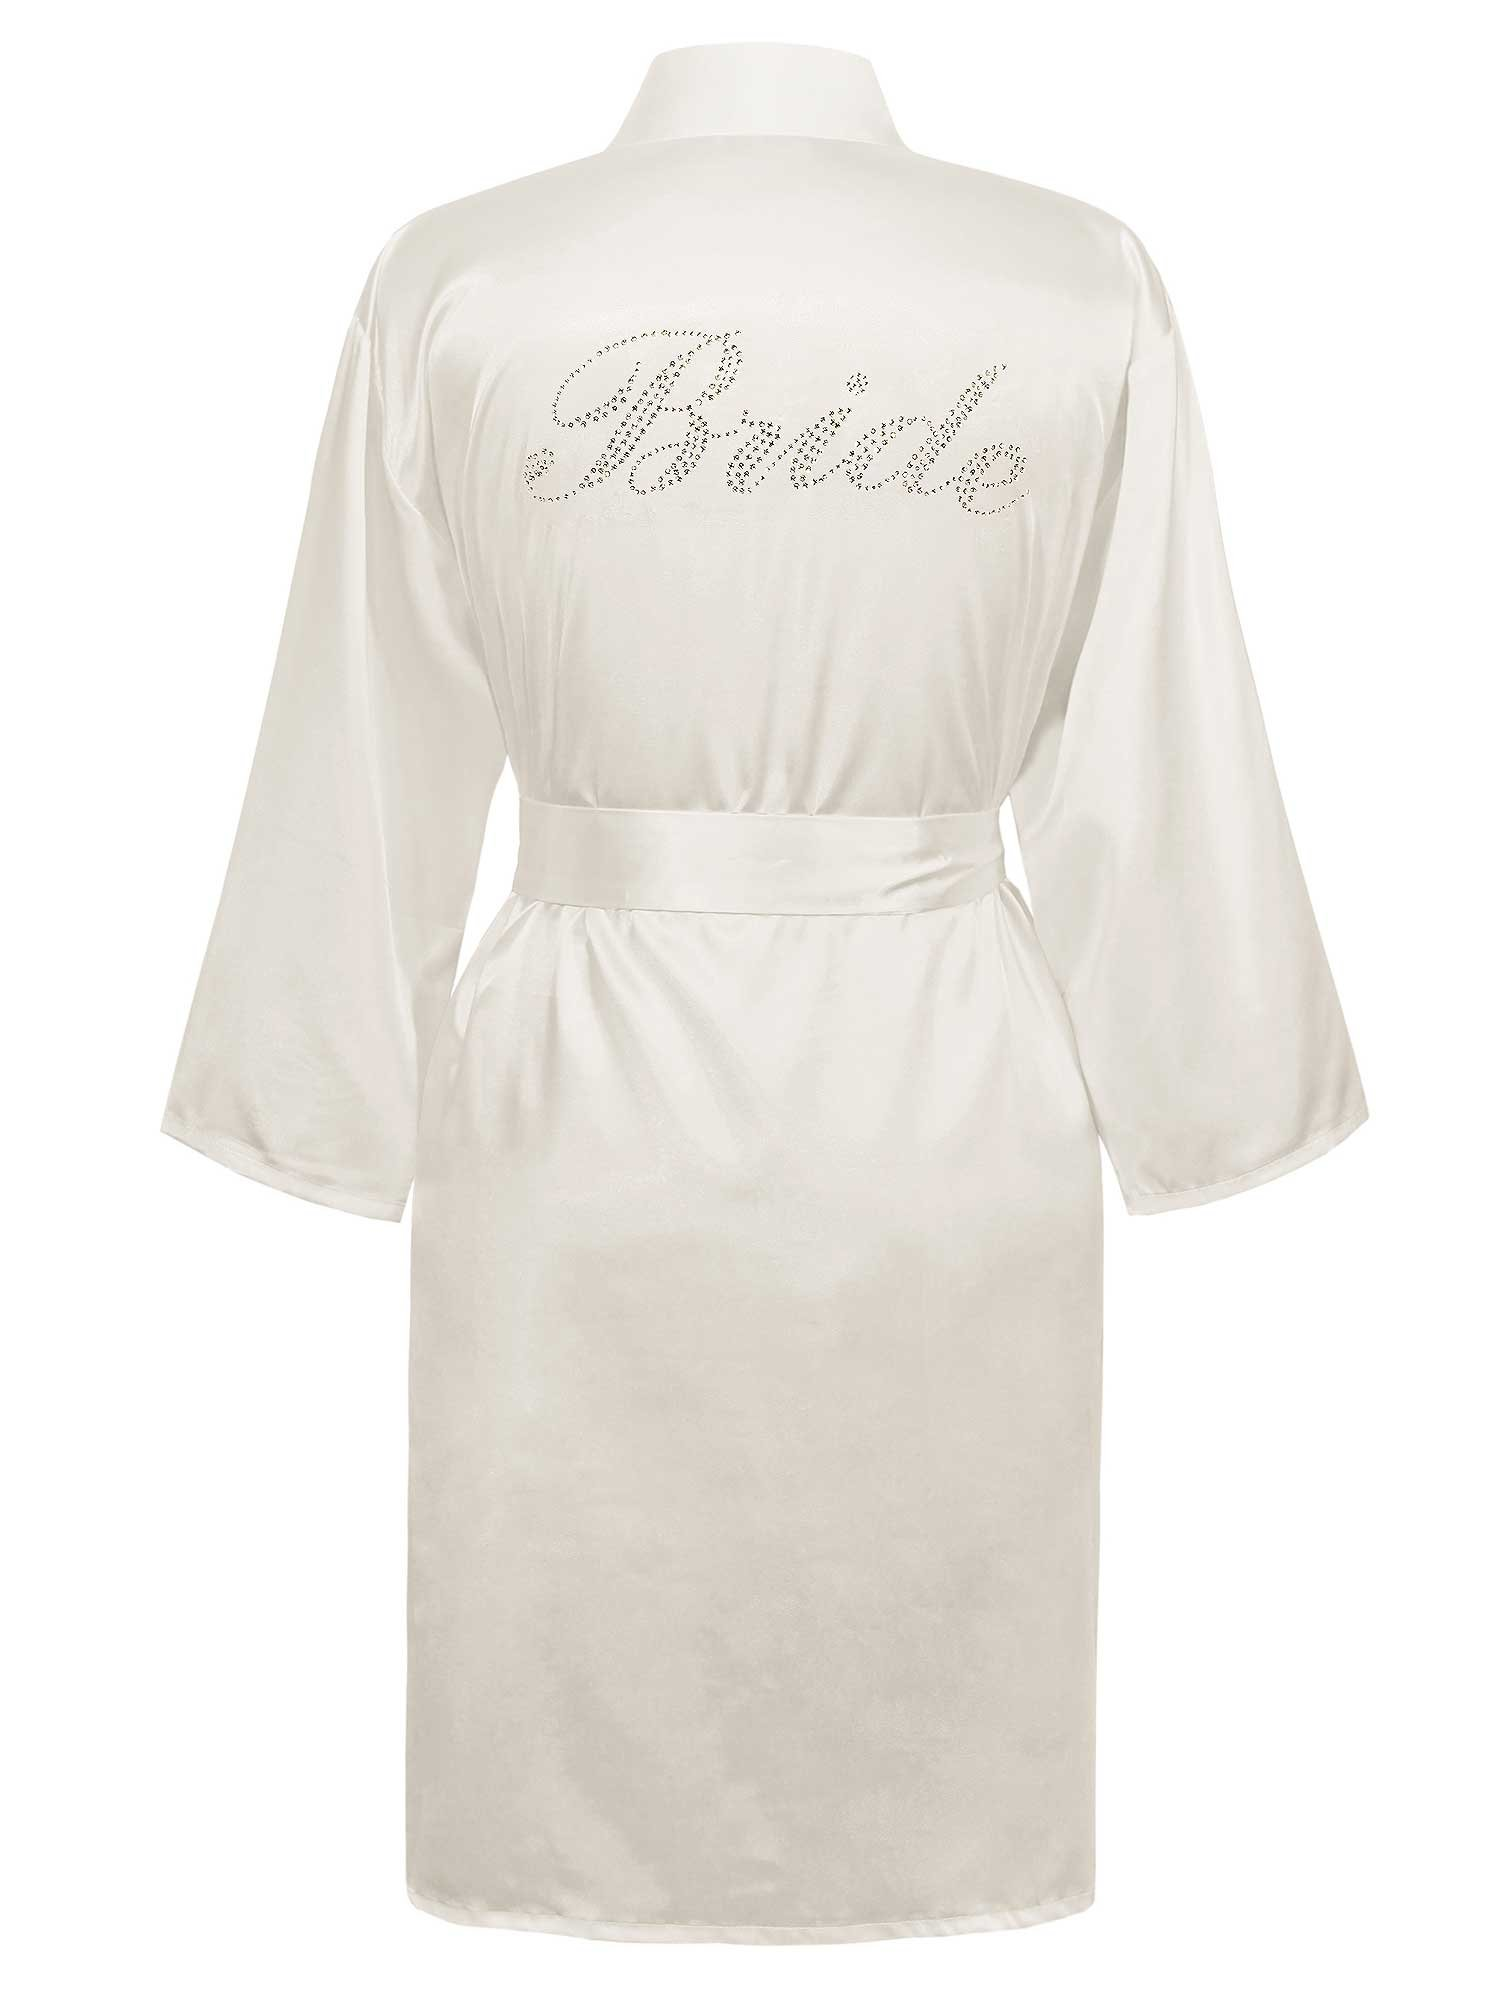 Swhiteme Bridal Robe with Rhinestones, Bride, Small/Medium, White